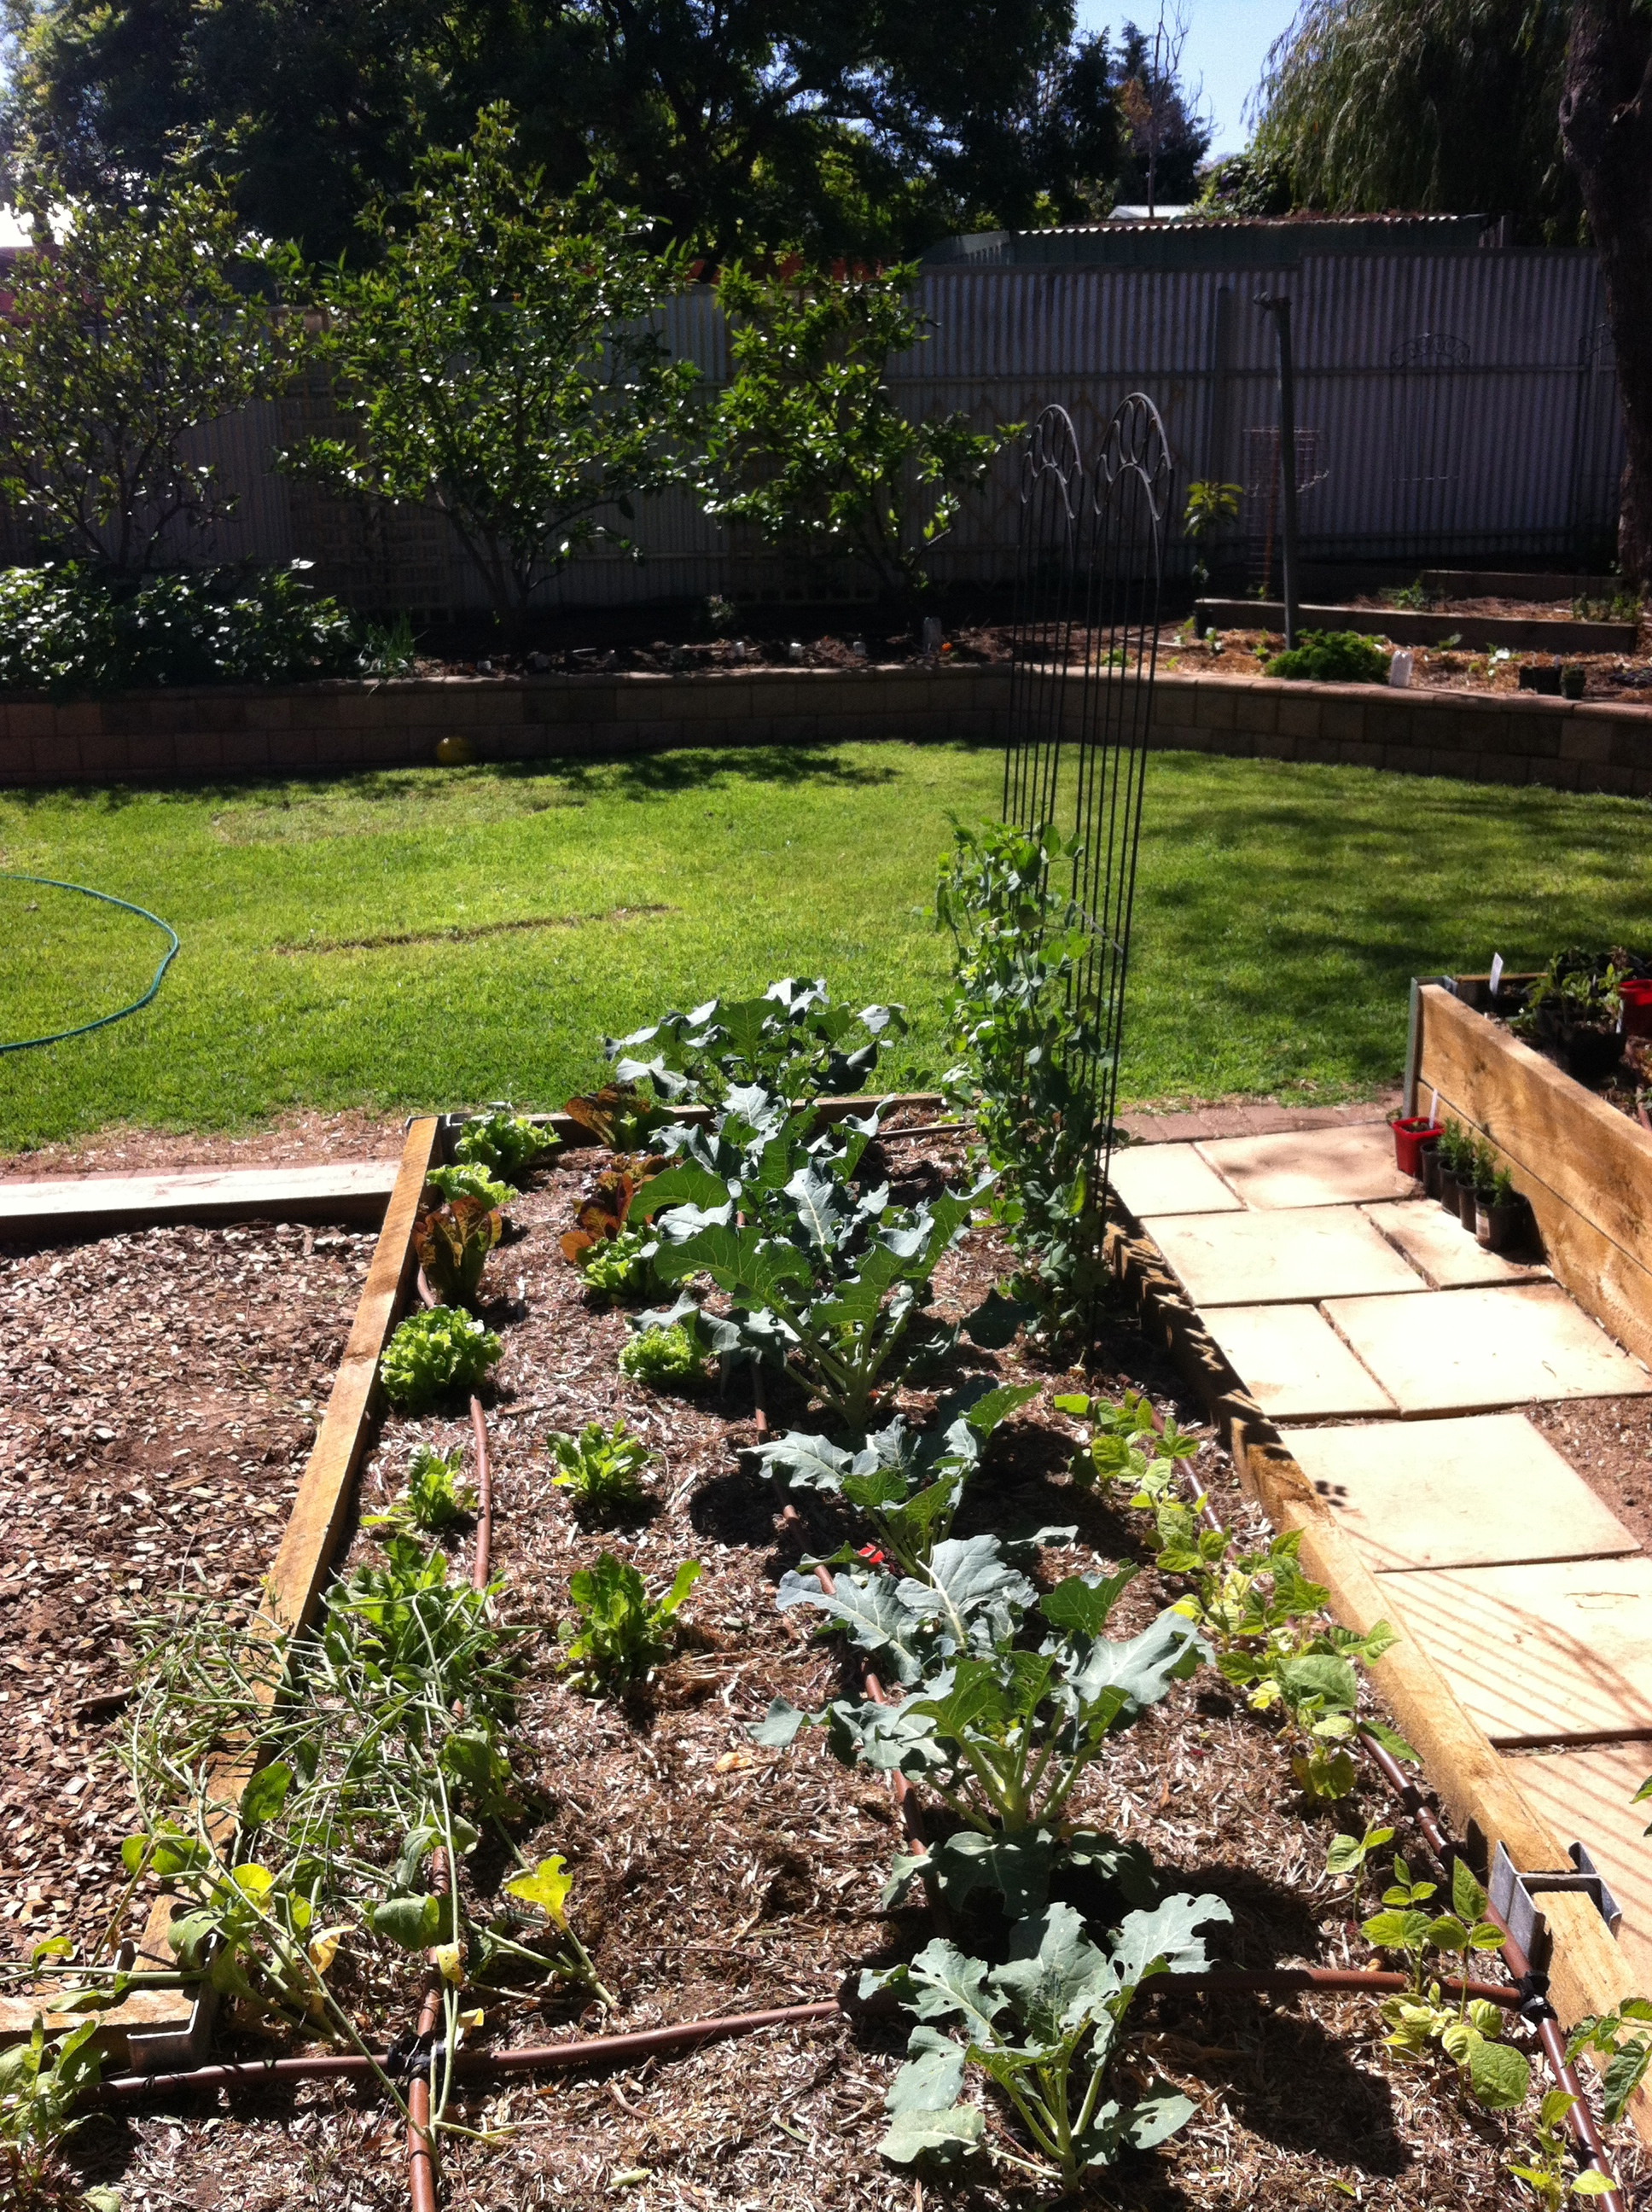 Welcome to Our Backyard Farm! | Pete's Backyard Farm